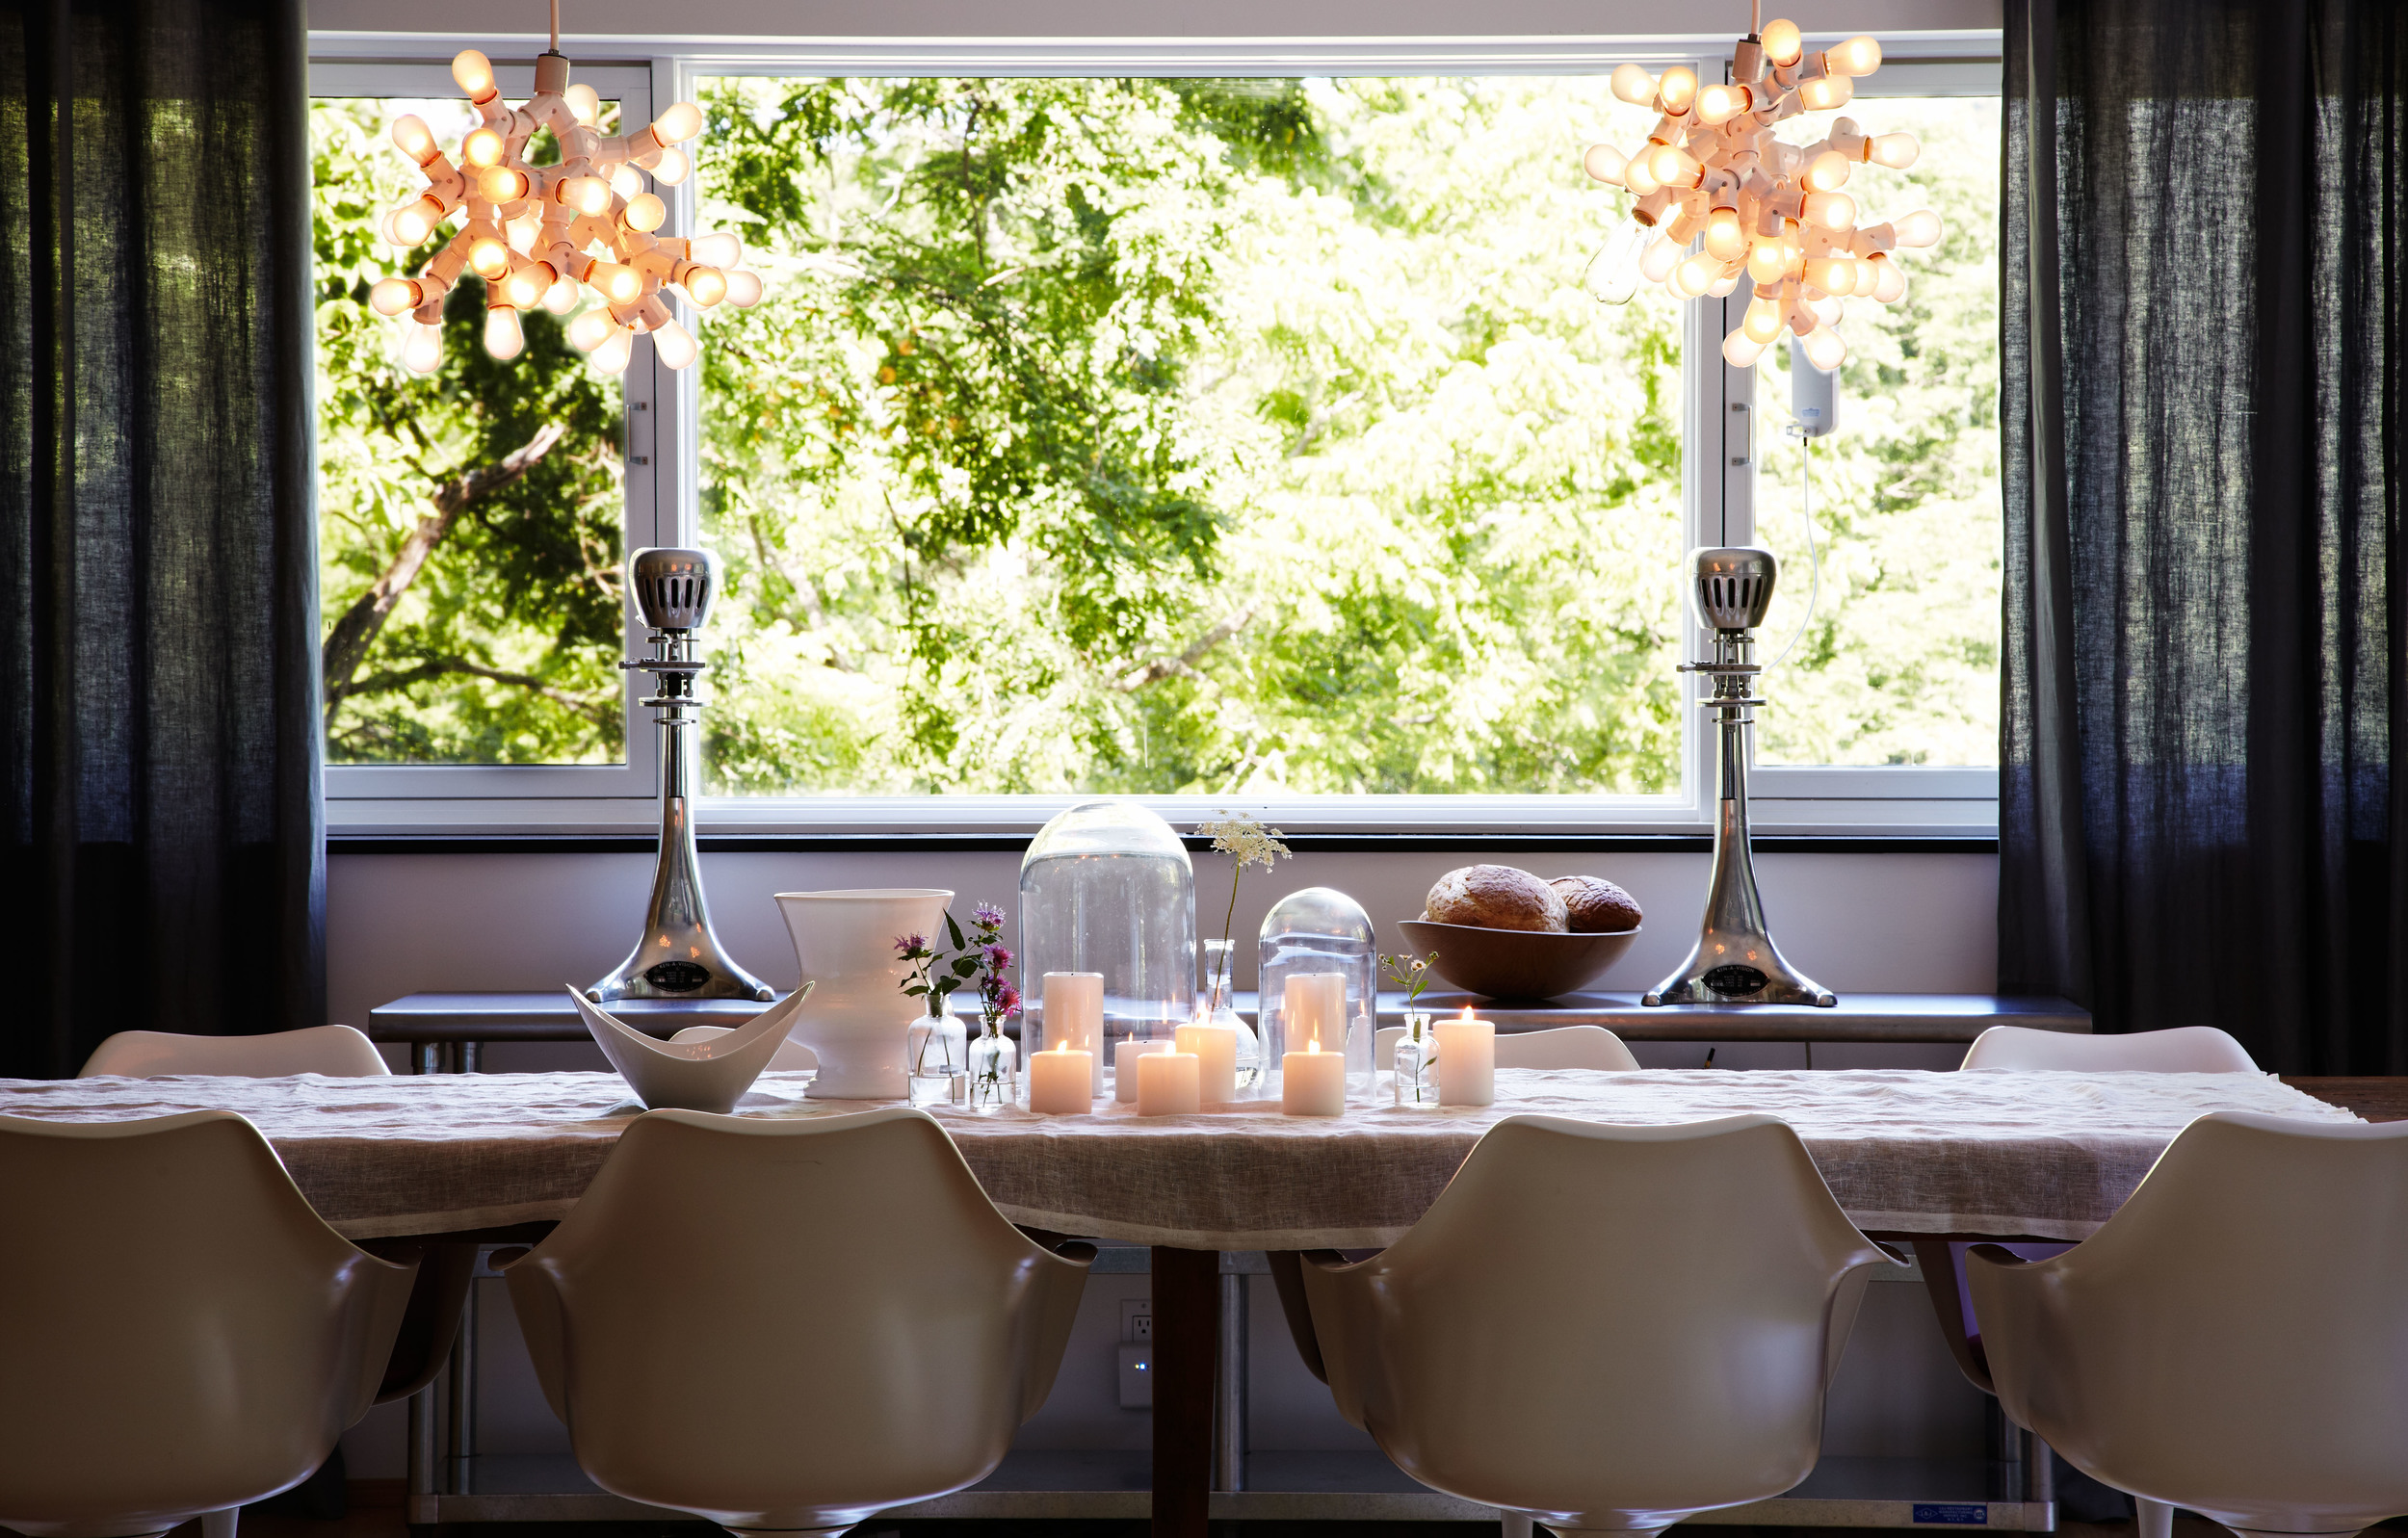 ghislaine viñas interior design clinton corners 2 153